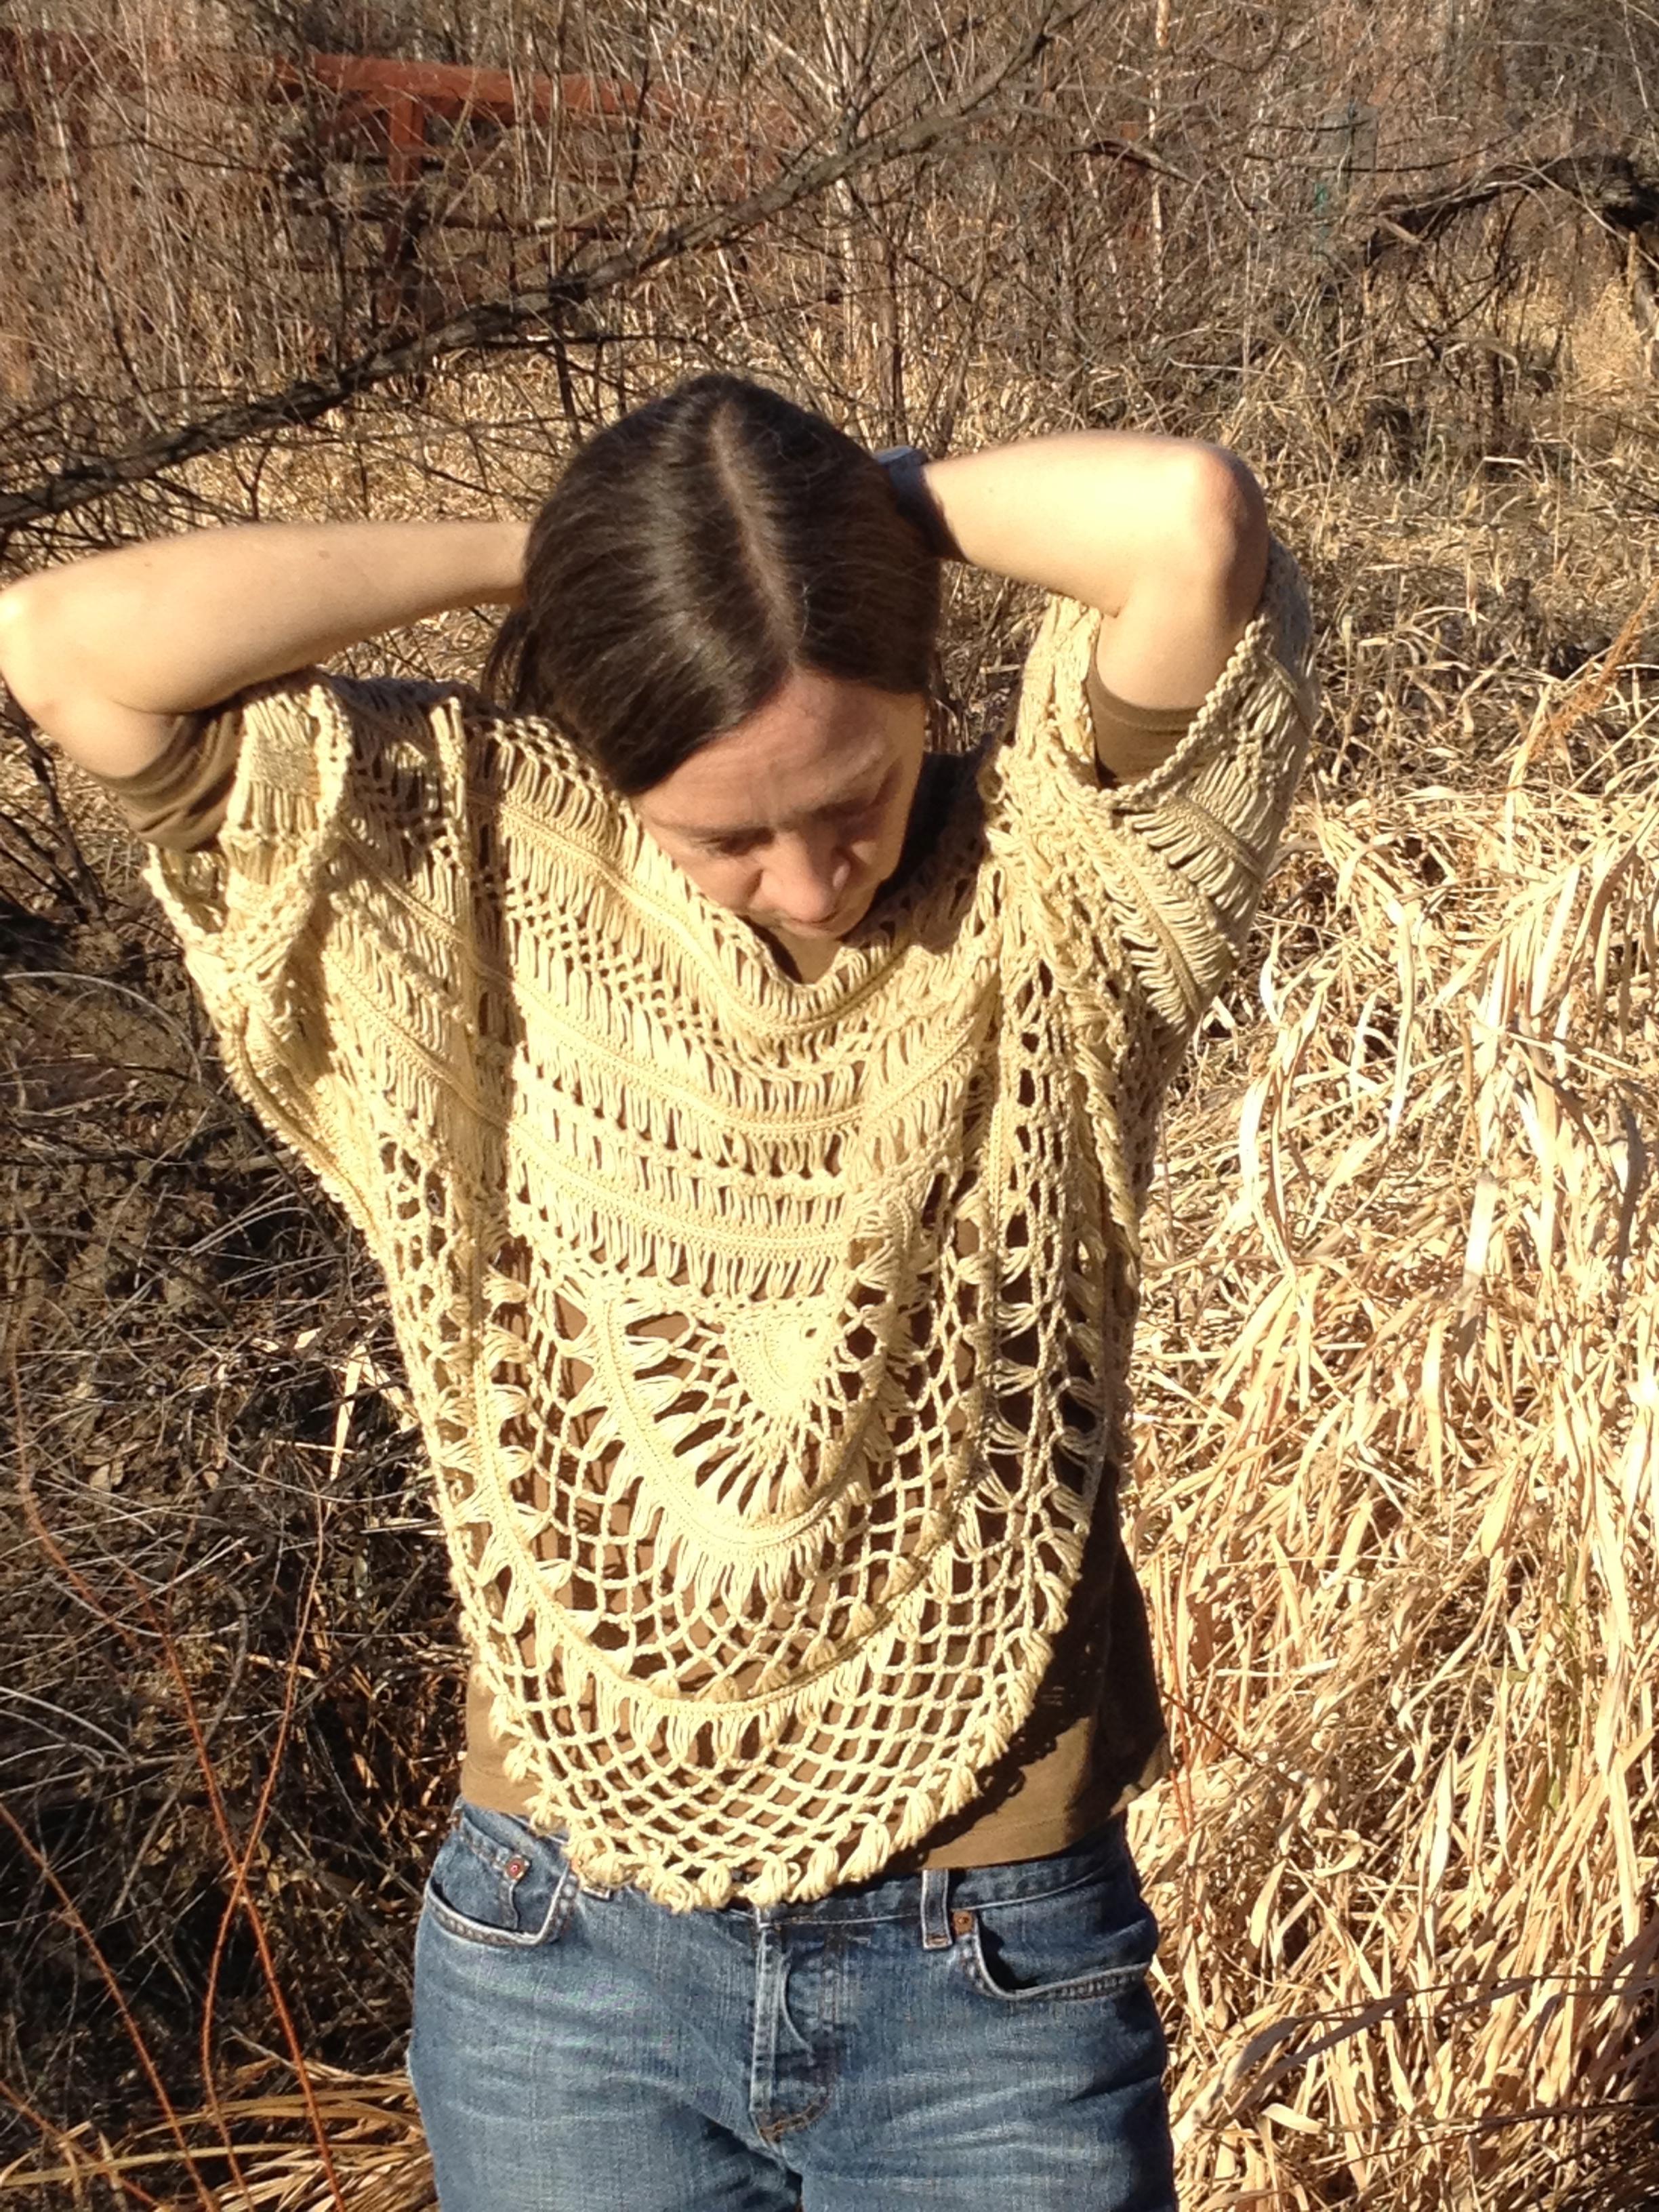 hairsweater2.jpg